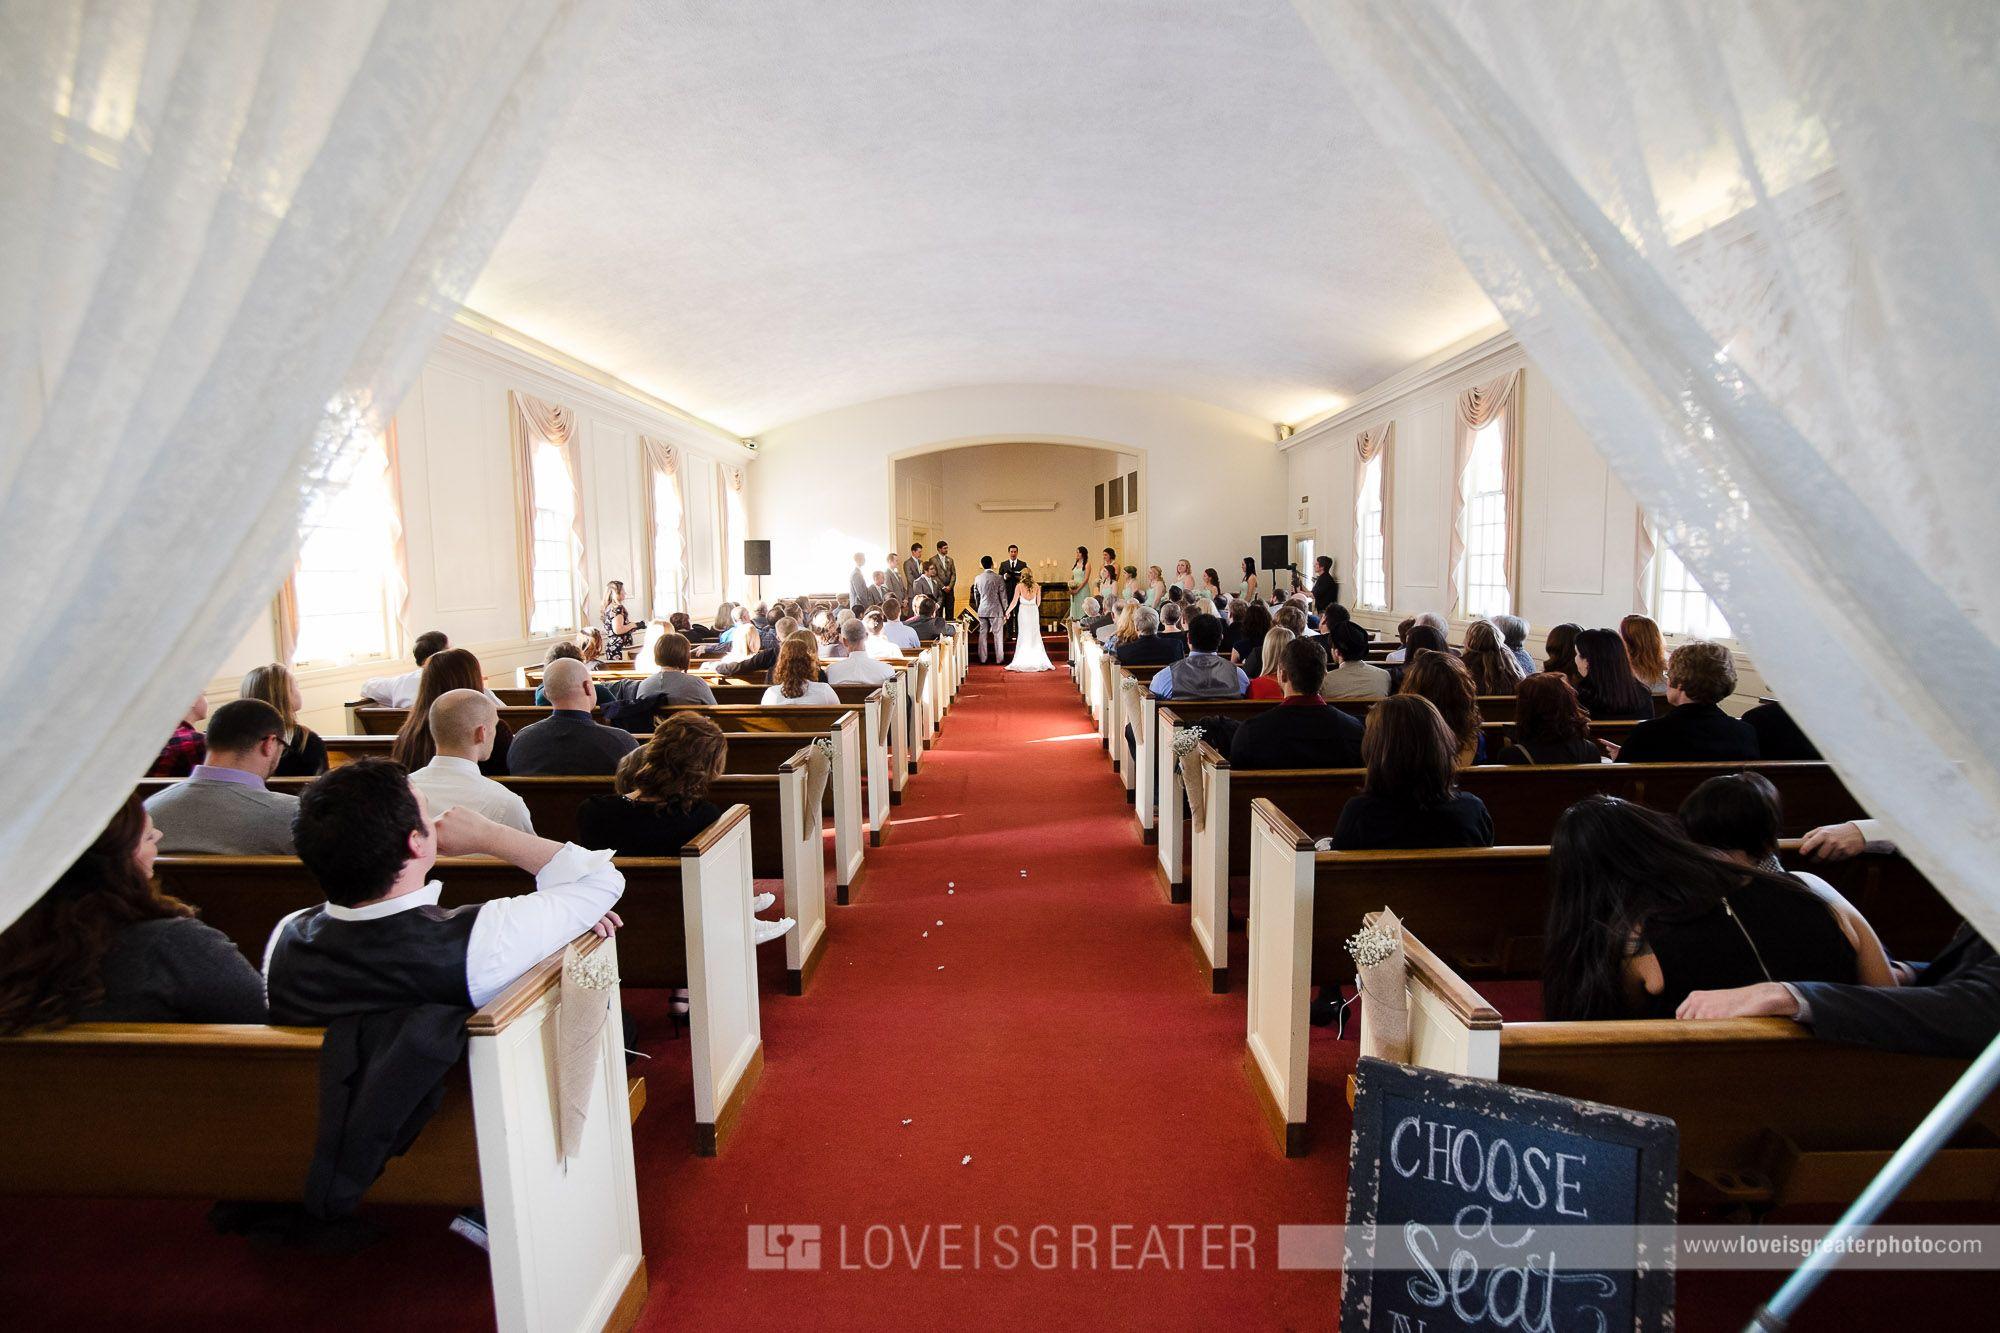 12 Stunning Toledo Wedding Venues You Have To See In 2020 Ohio Wedding Venues Outdoor Dance Floors Wedding Venues